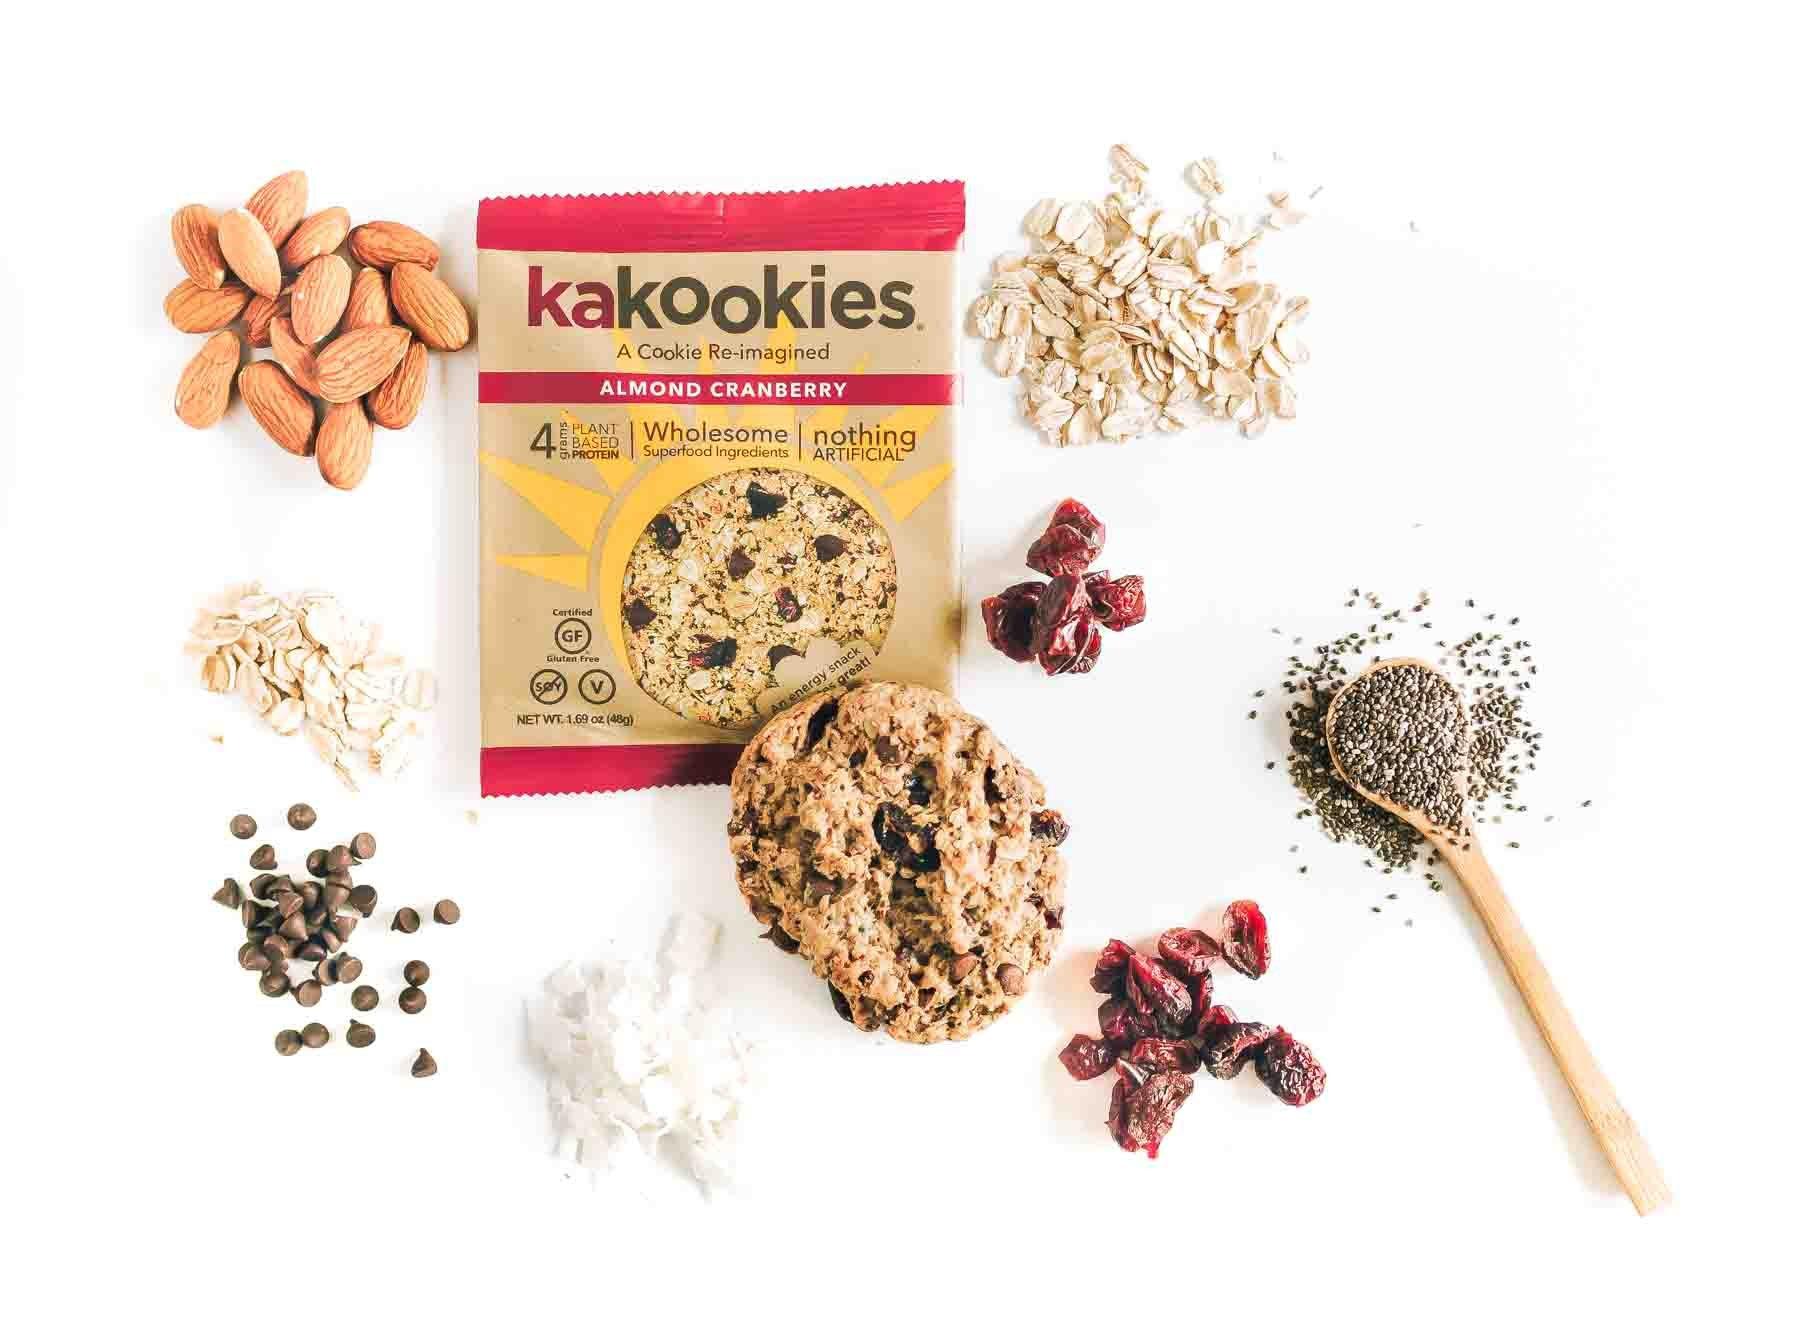 Kakookies Superfood Snack Cookies with no artificial sweeteners, flavors, or preservatives